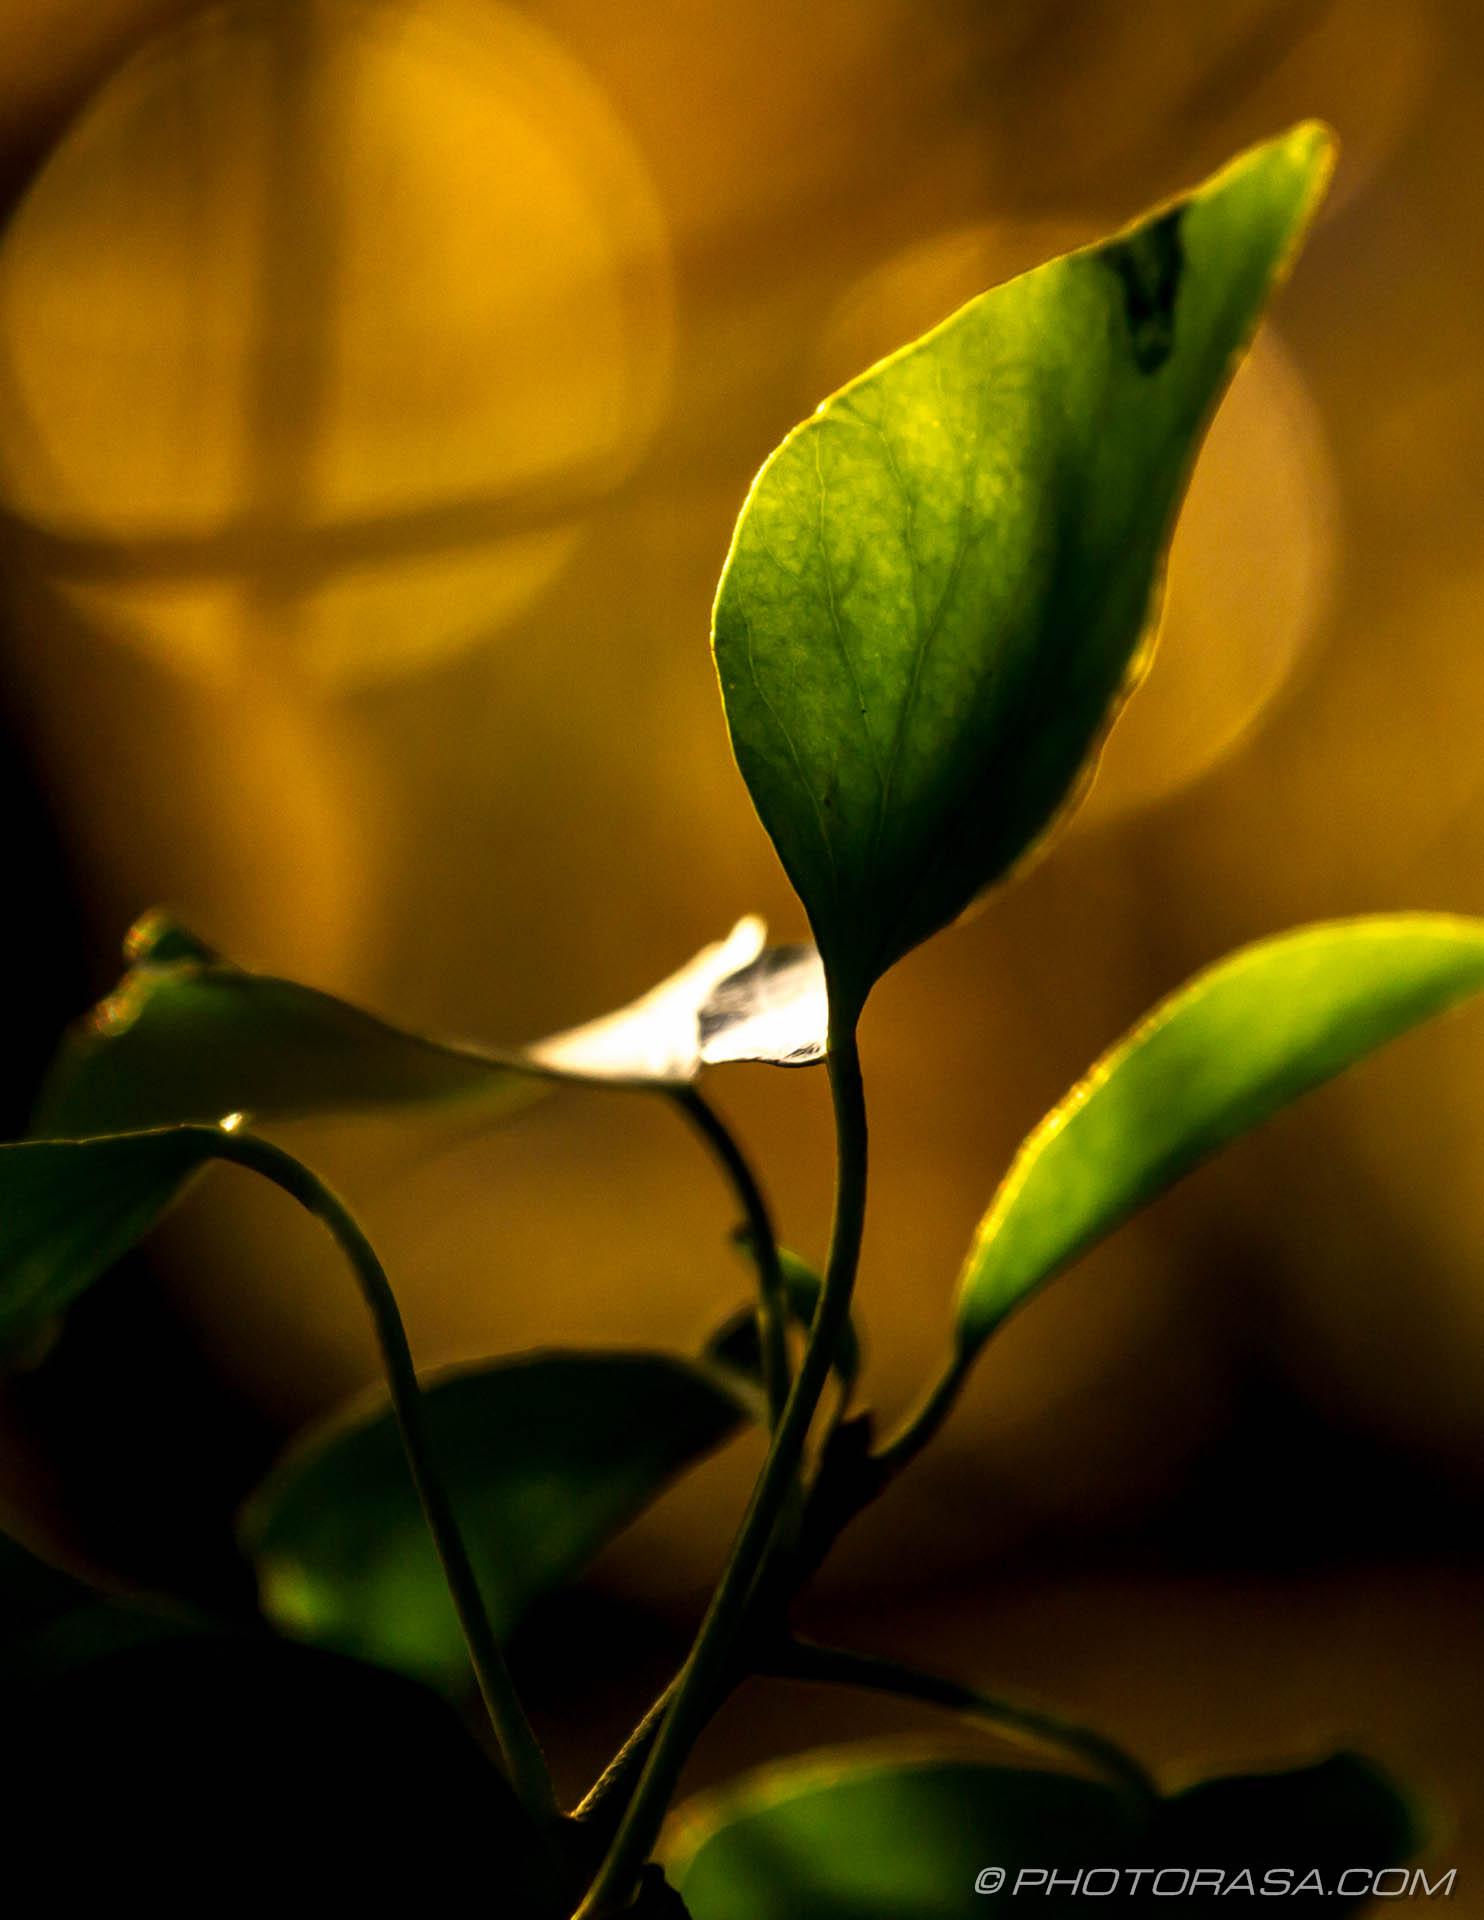 http://photorasa.com/autumn-leaves-sunlight/transparent-vine-leaves-in-autumn-light/